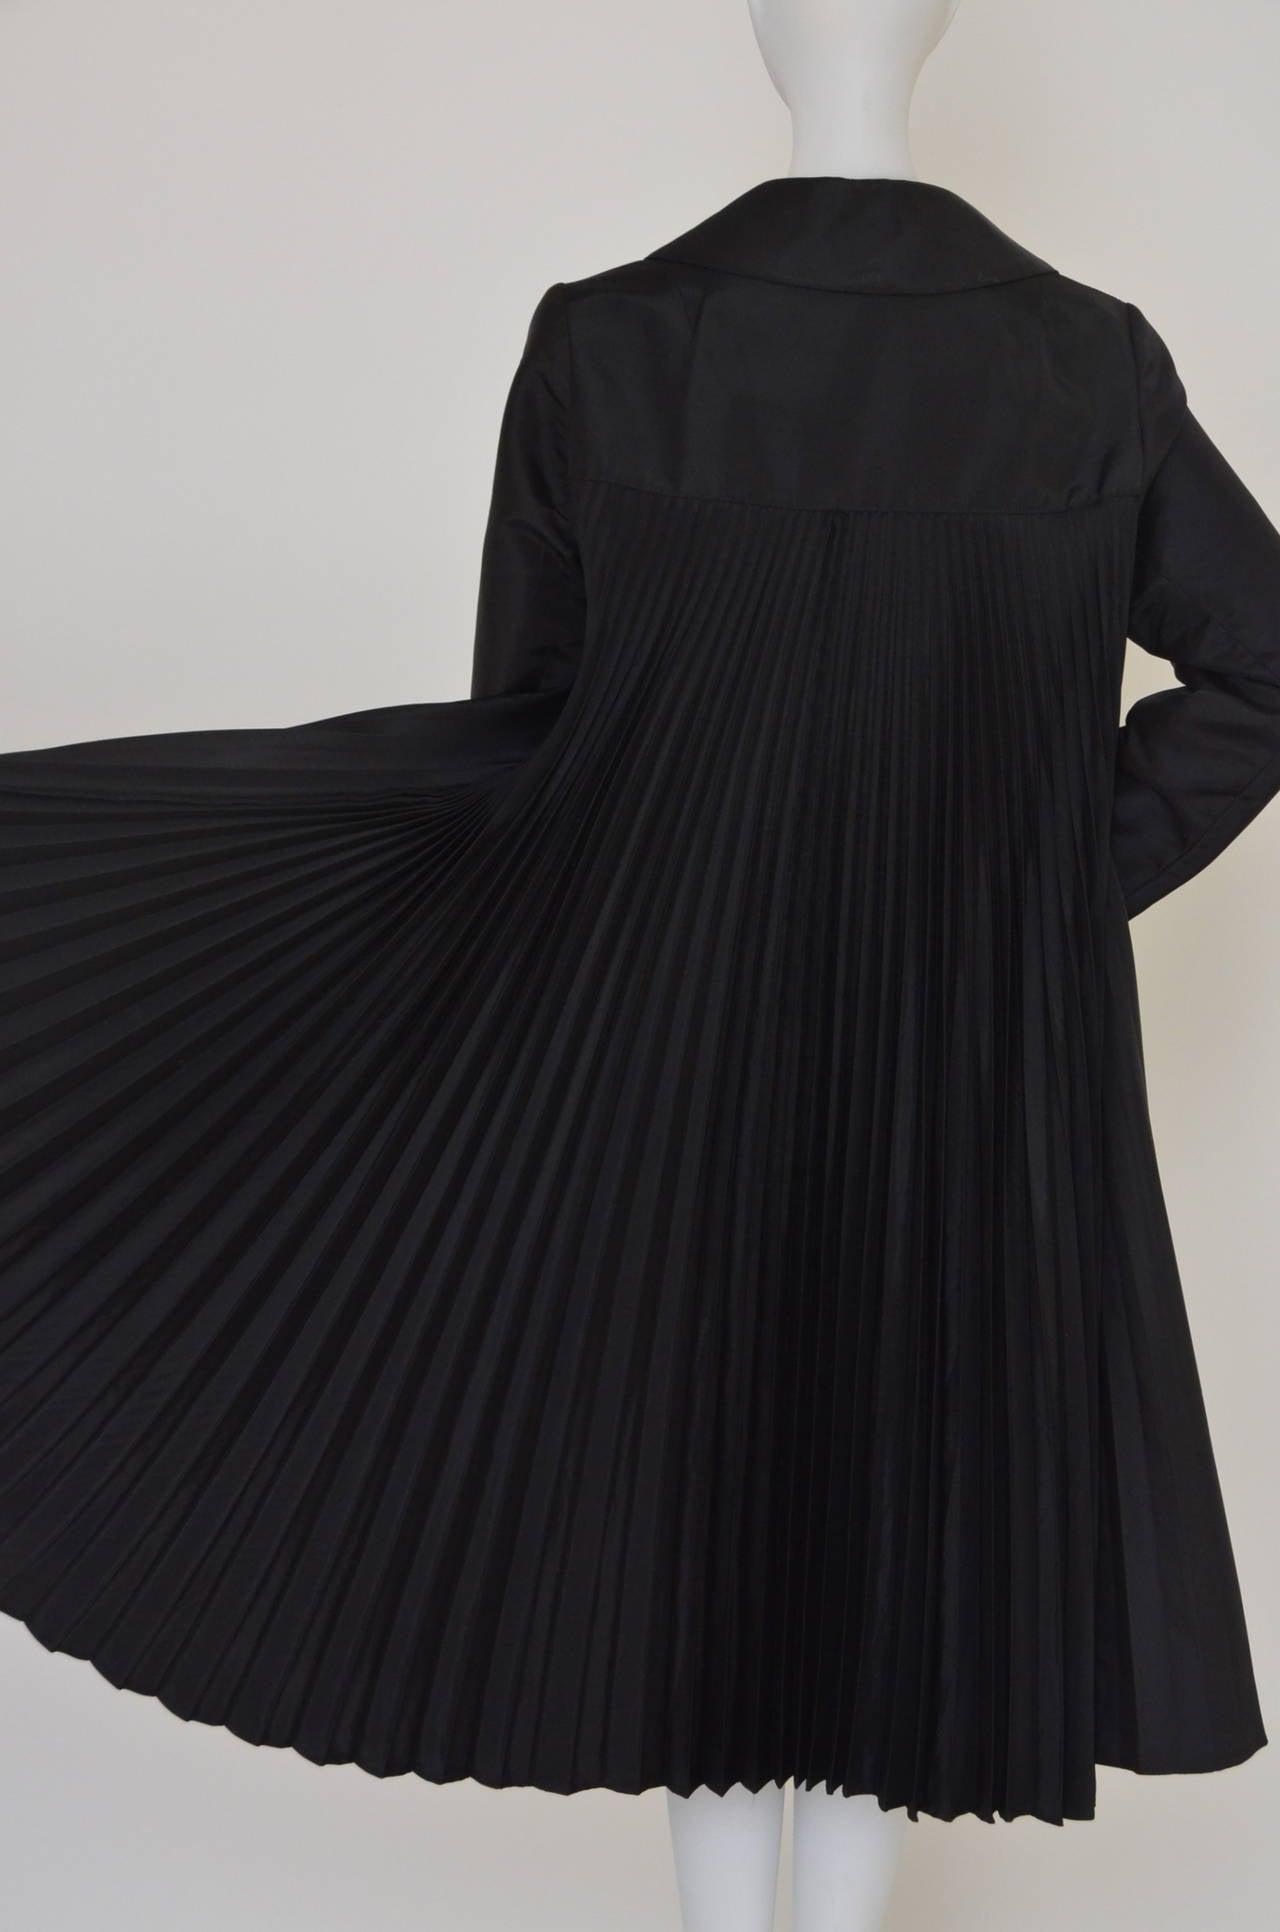 Oscar De La Renta Black  Pleated Swing Coat      1960's In Good Condition For Sale In Hollywood, FL